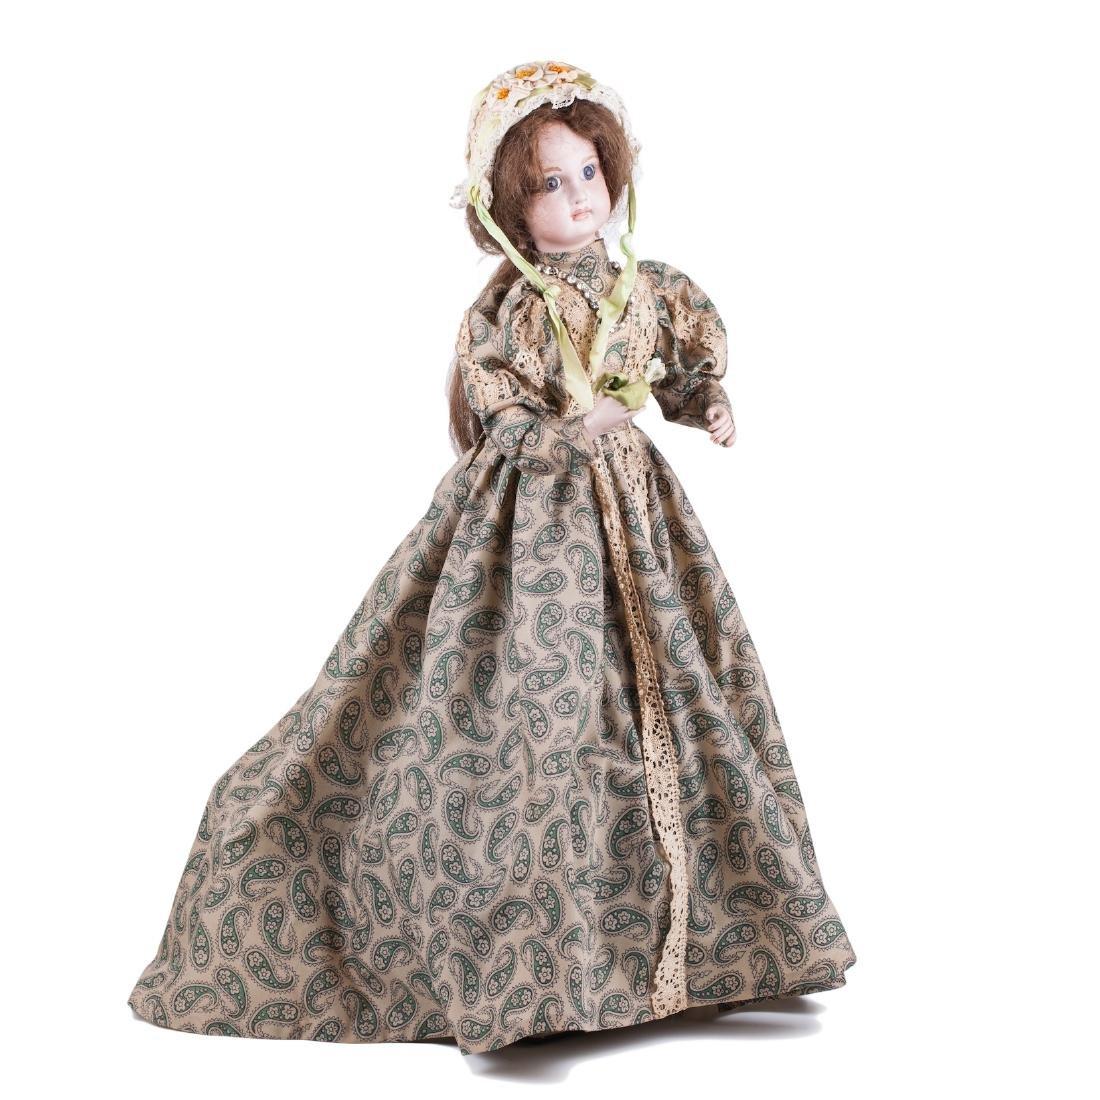 Huge JUMEAU automaton musical doll